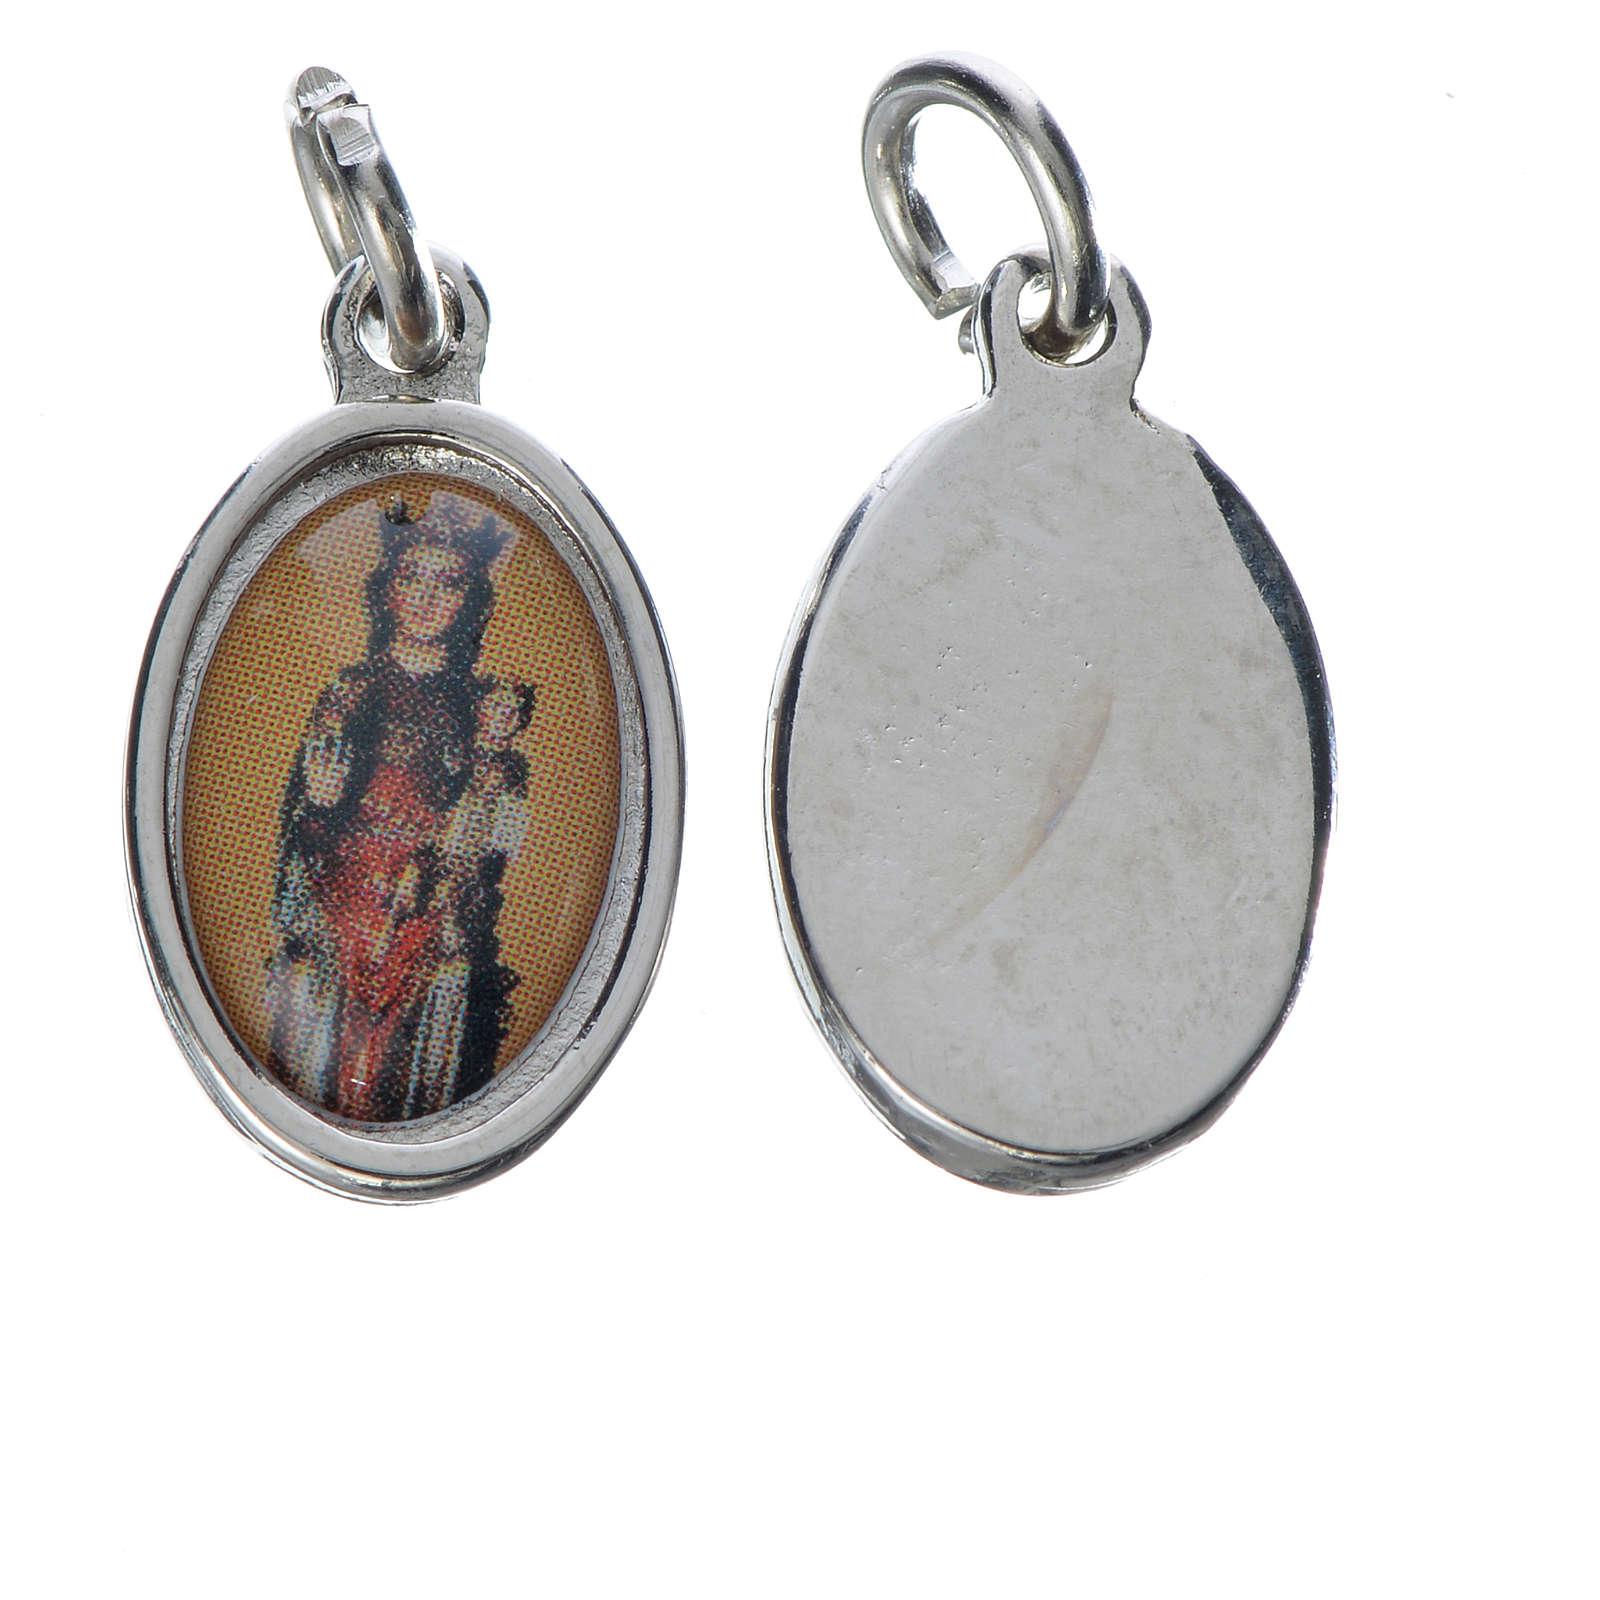 Notre Dame de Fenestre medal in silver metal, 1.5cm 4